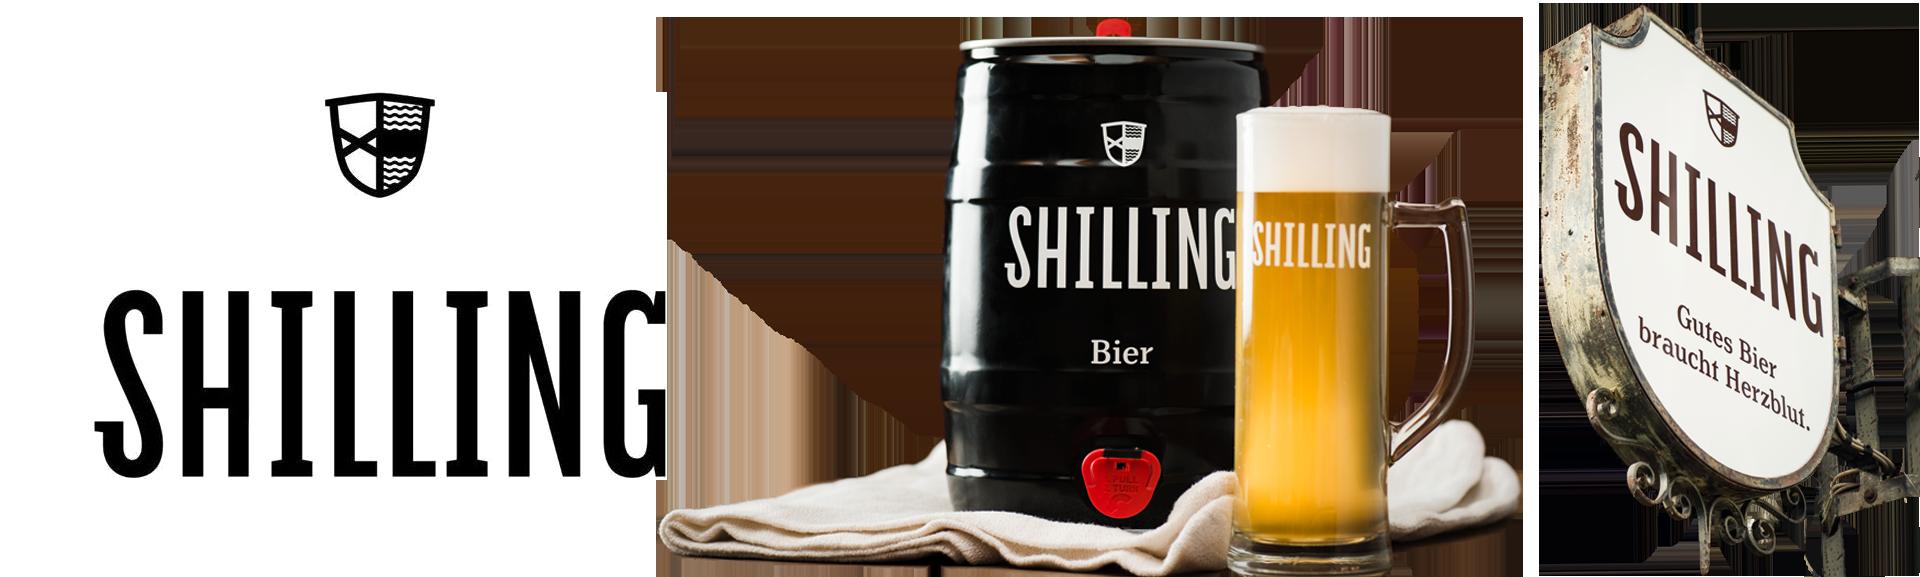 Schilling-Bier-Slide2